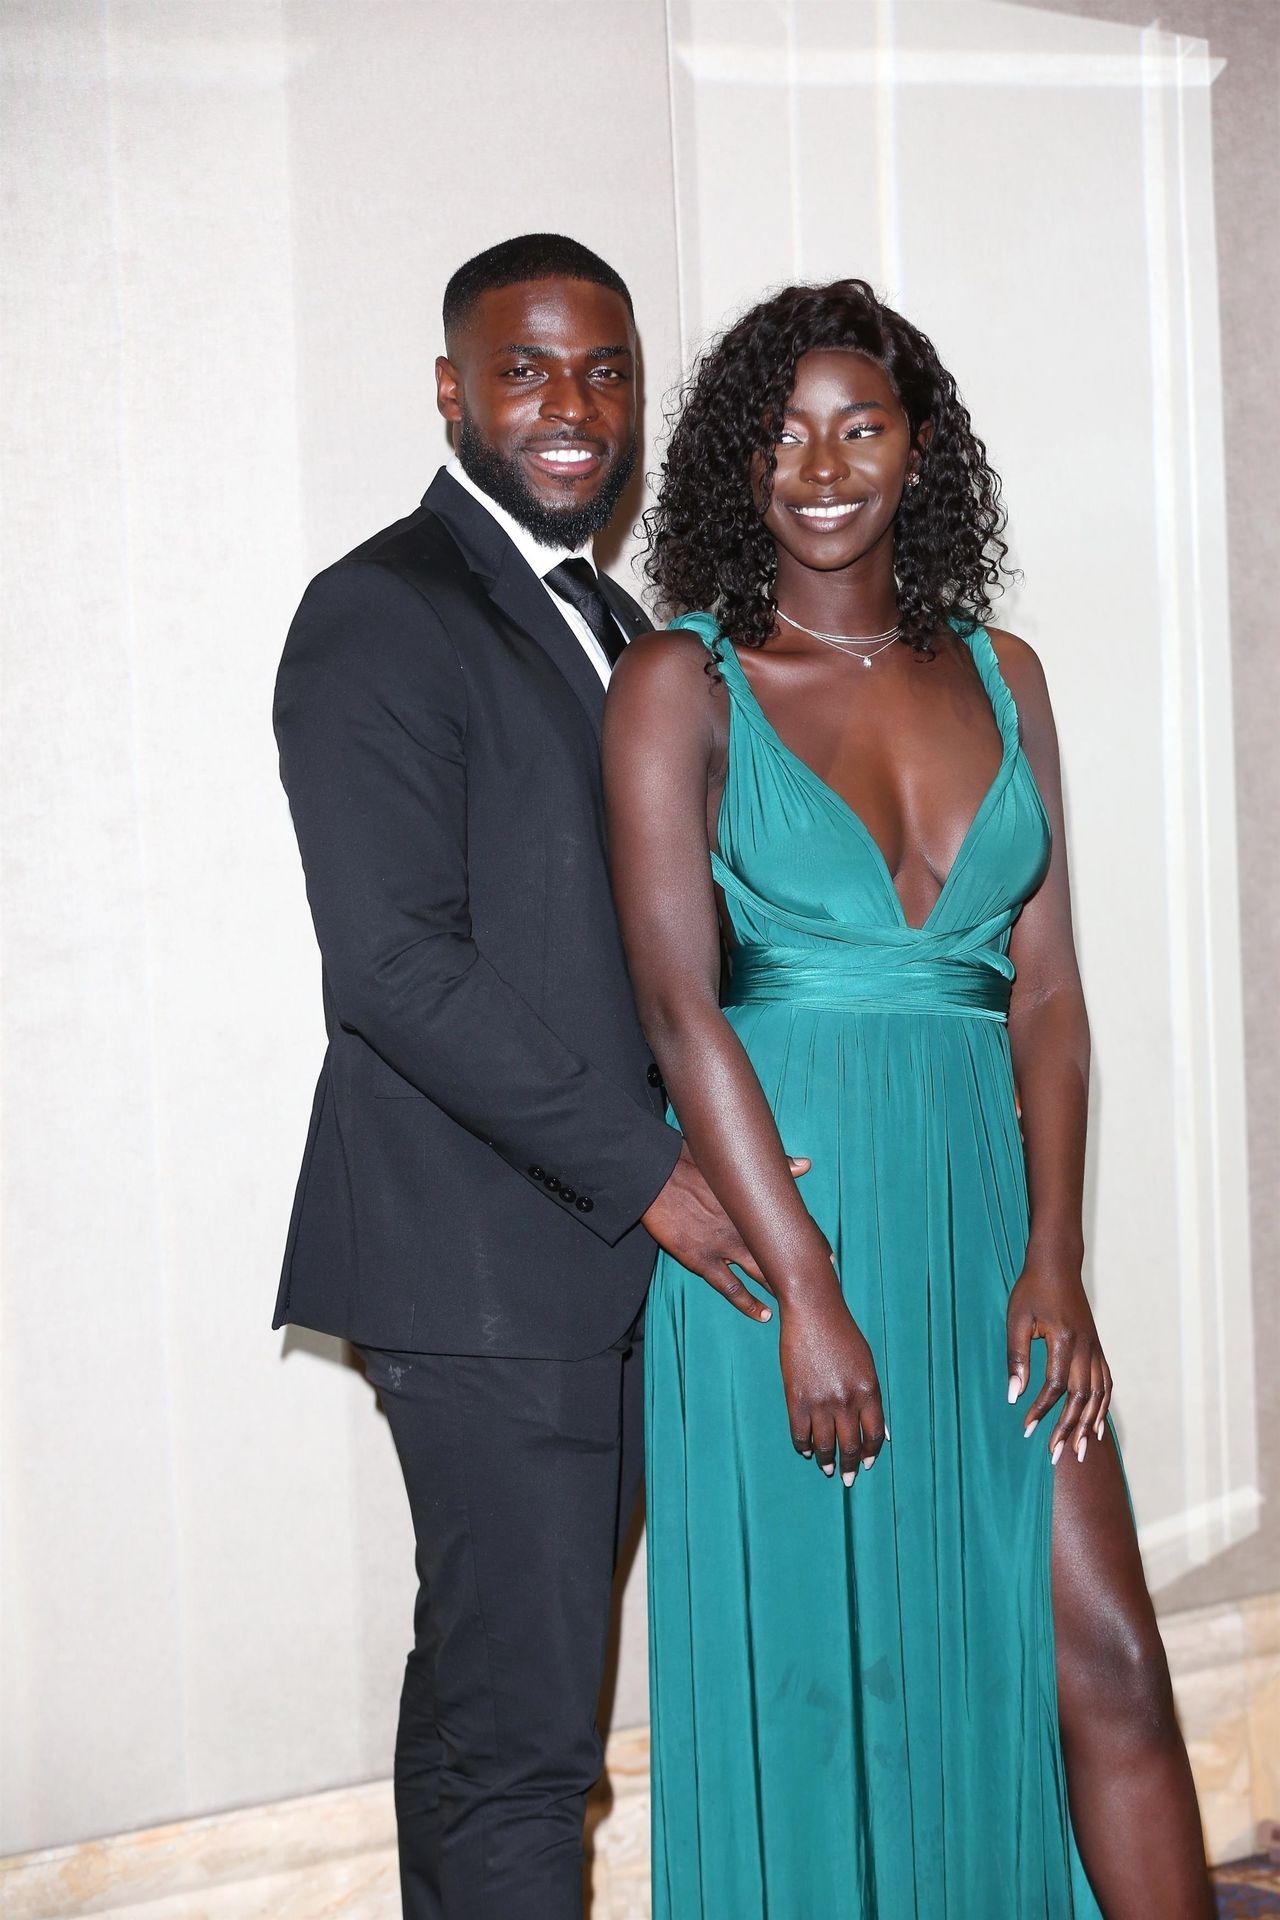 Mike Boateng & Priscilla Anyabu Are Seen At British Ethnic Diversity Sports Awards 0134